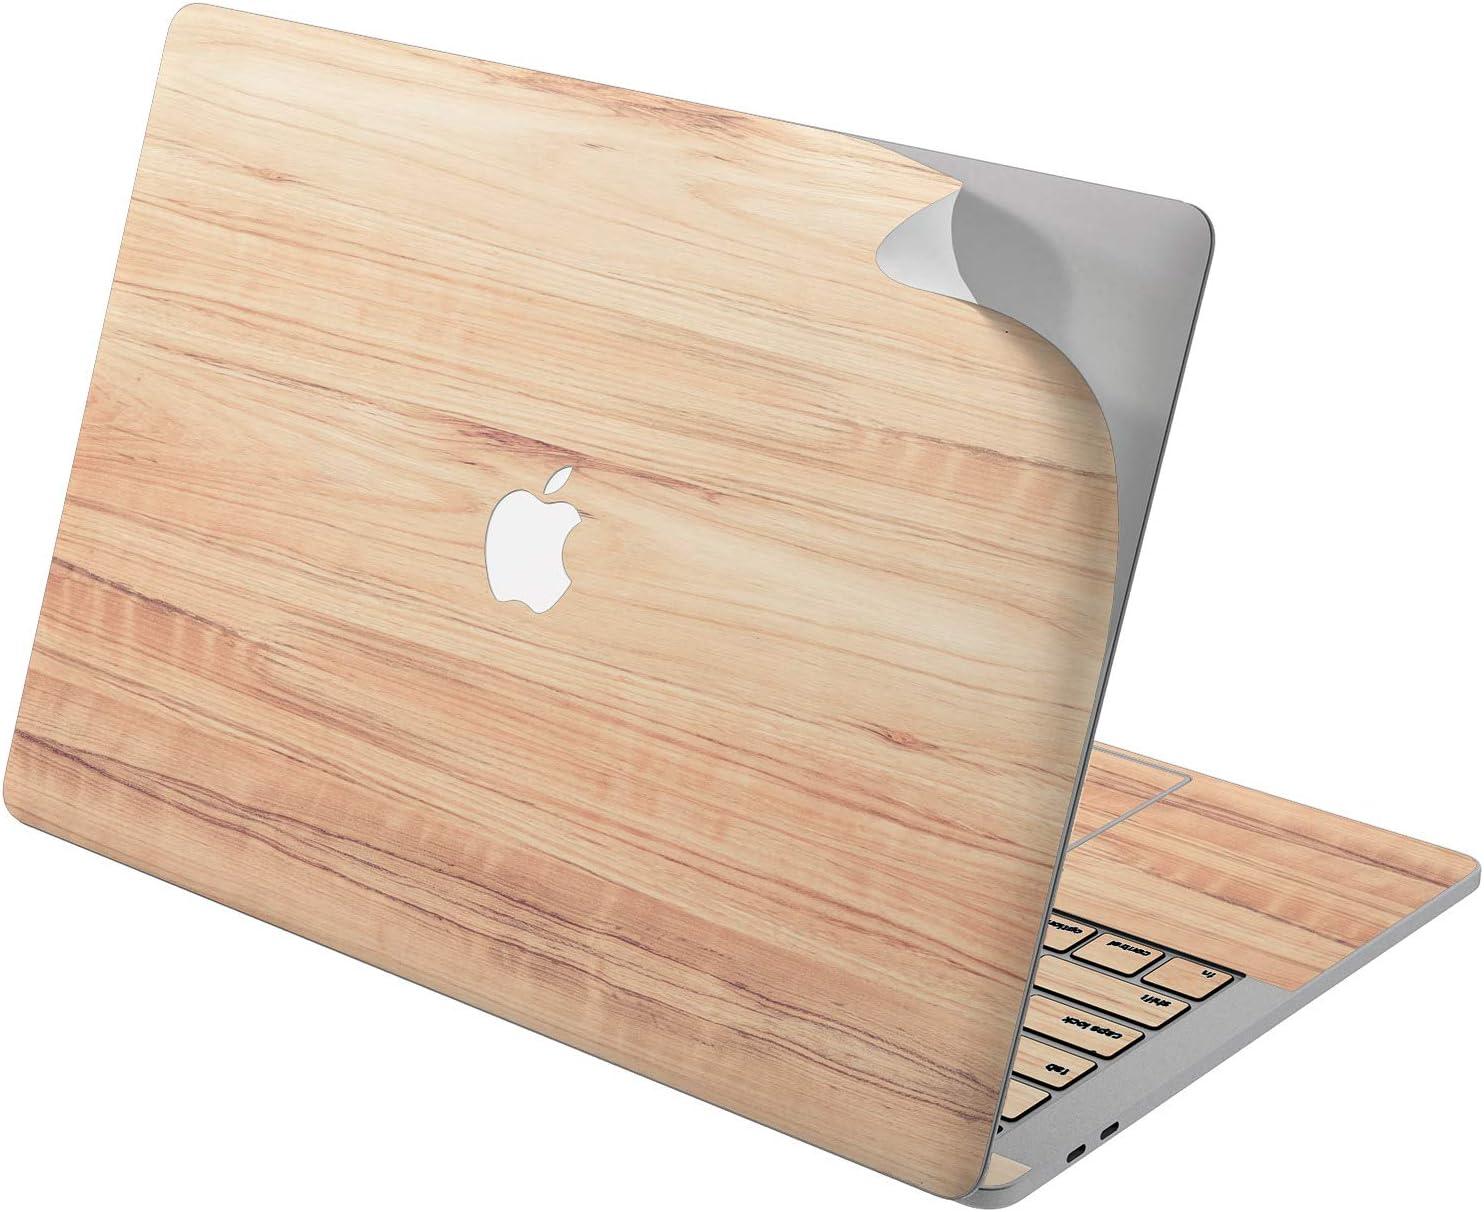 "Cavka Vinyl Decal Skin for Apple MacBook Pro 13"" 2019 15"" 2018 Air 13"" 2020 Retina 2015 Mac 11"" Mac 12"" Design Natural Board Art Protective Laptop Woody Trendy Cover Realistic Texture Sticker Print"